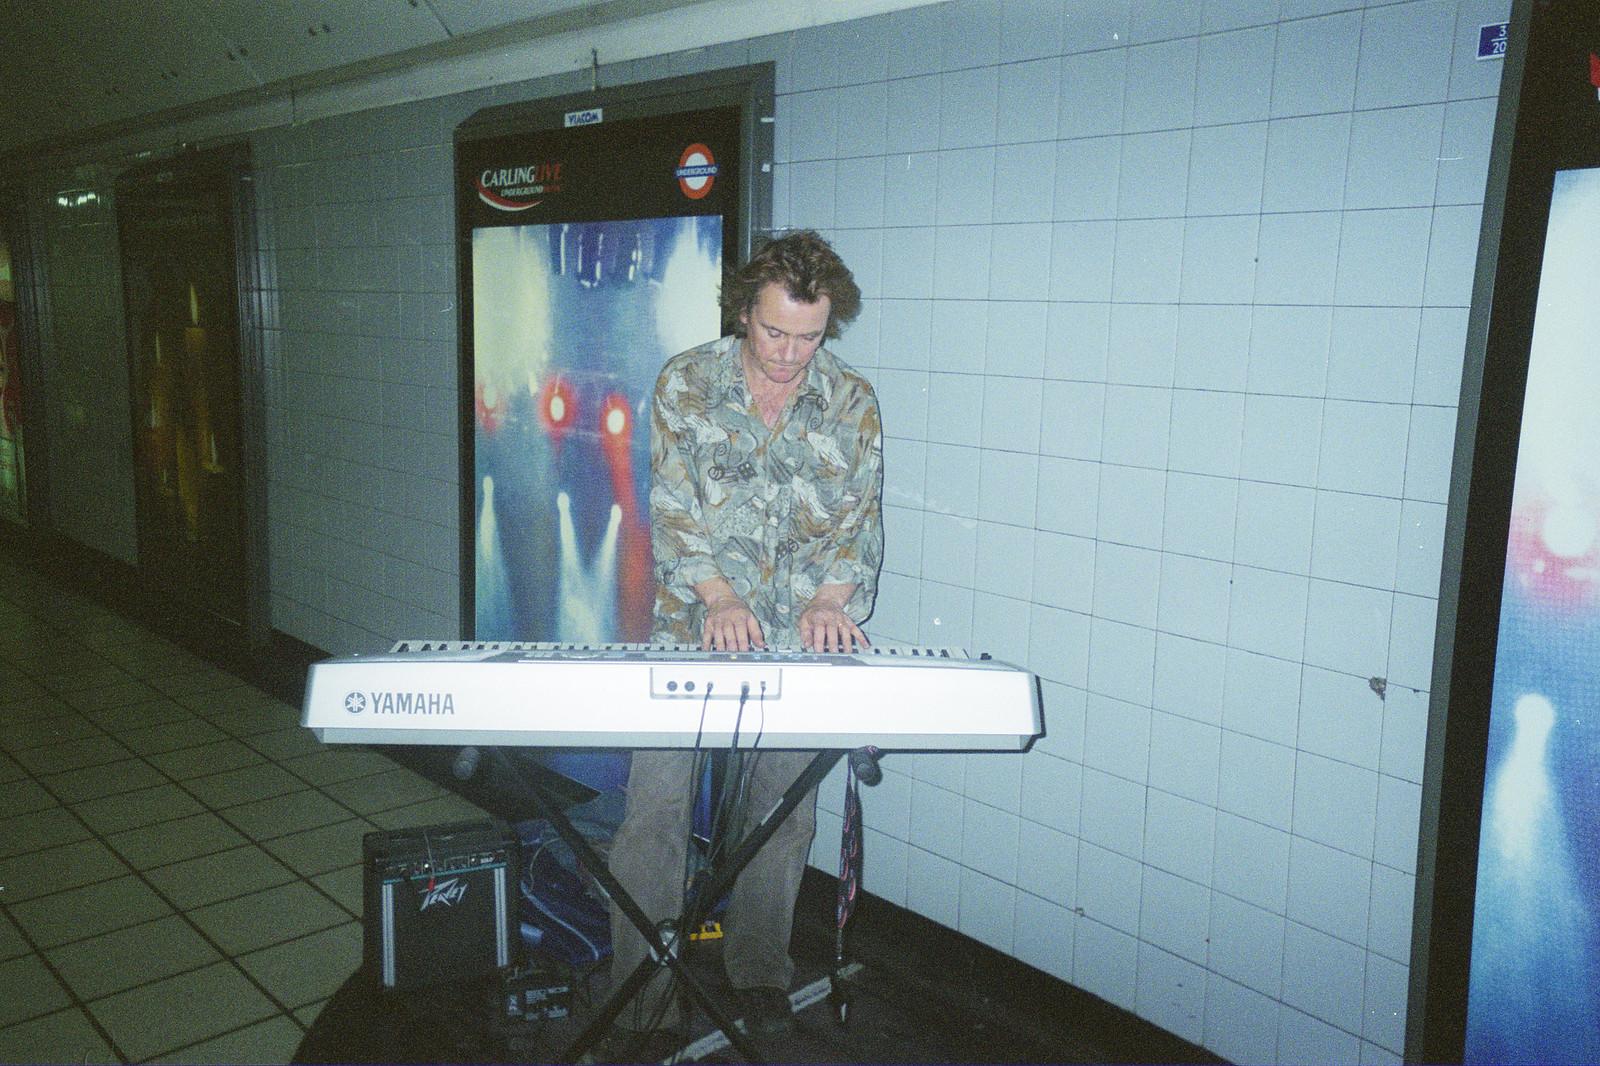 London Ireland  2004 009